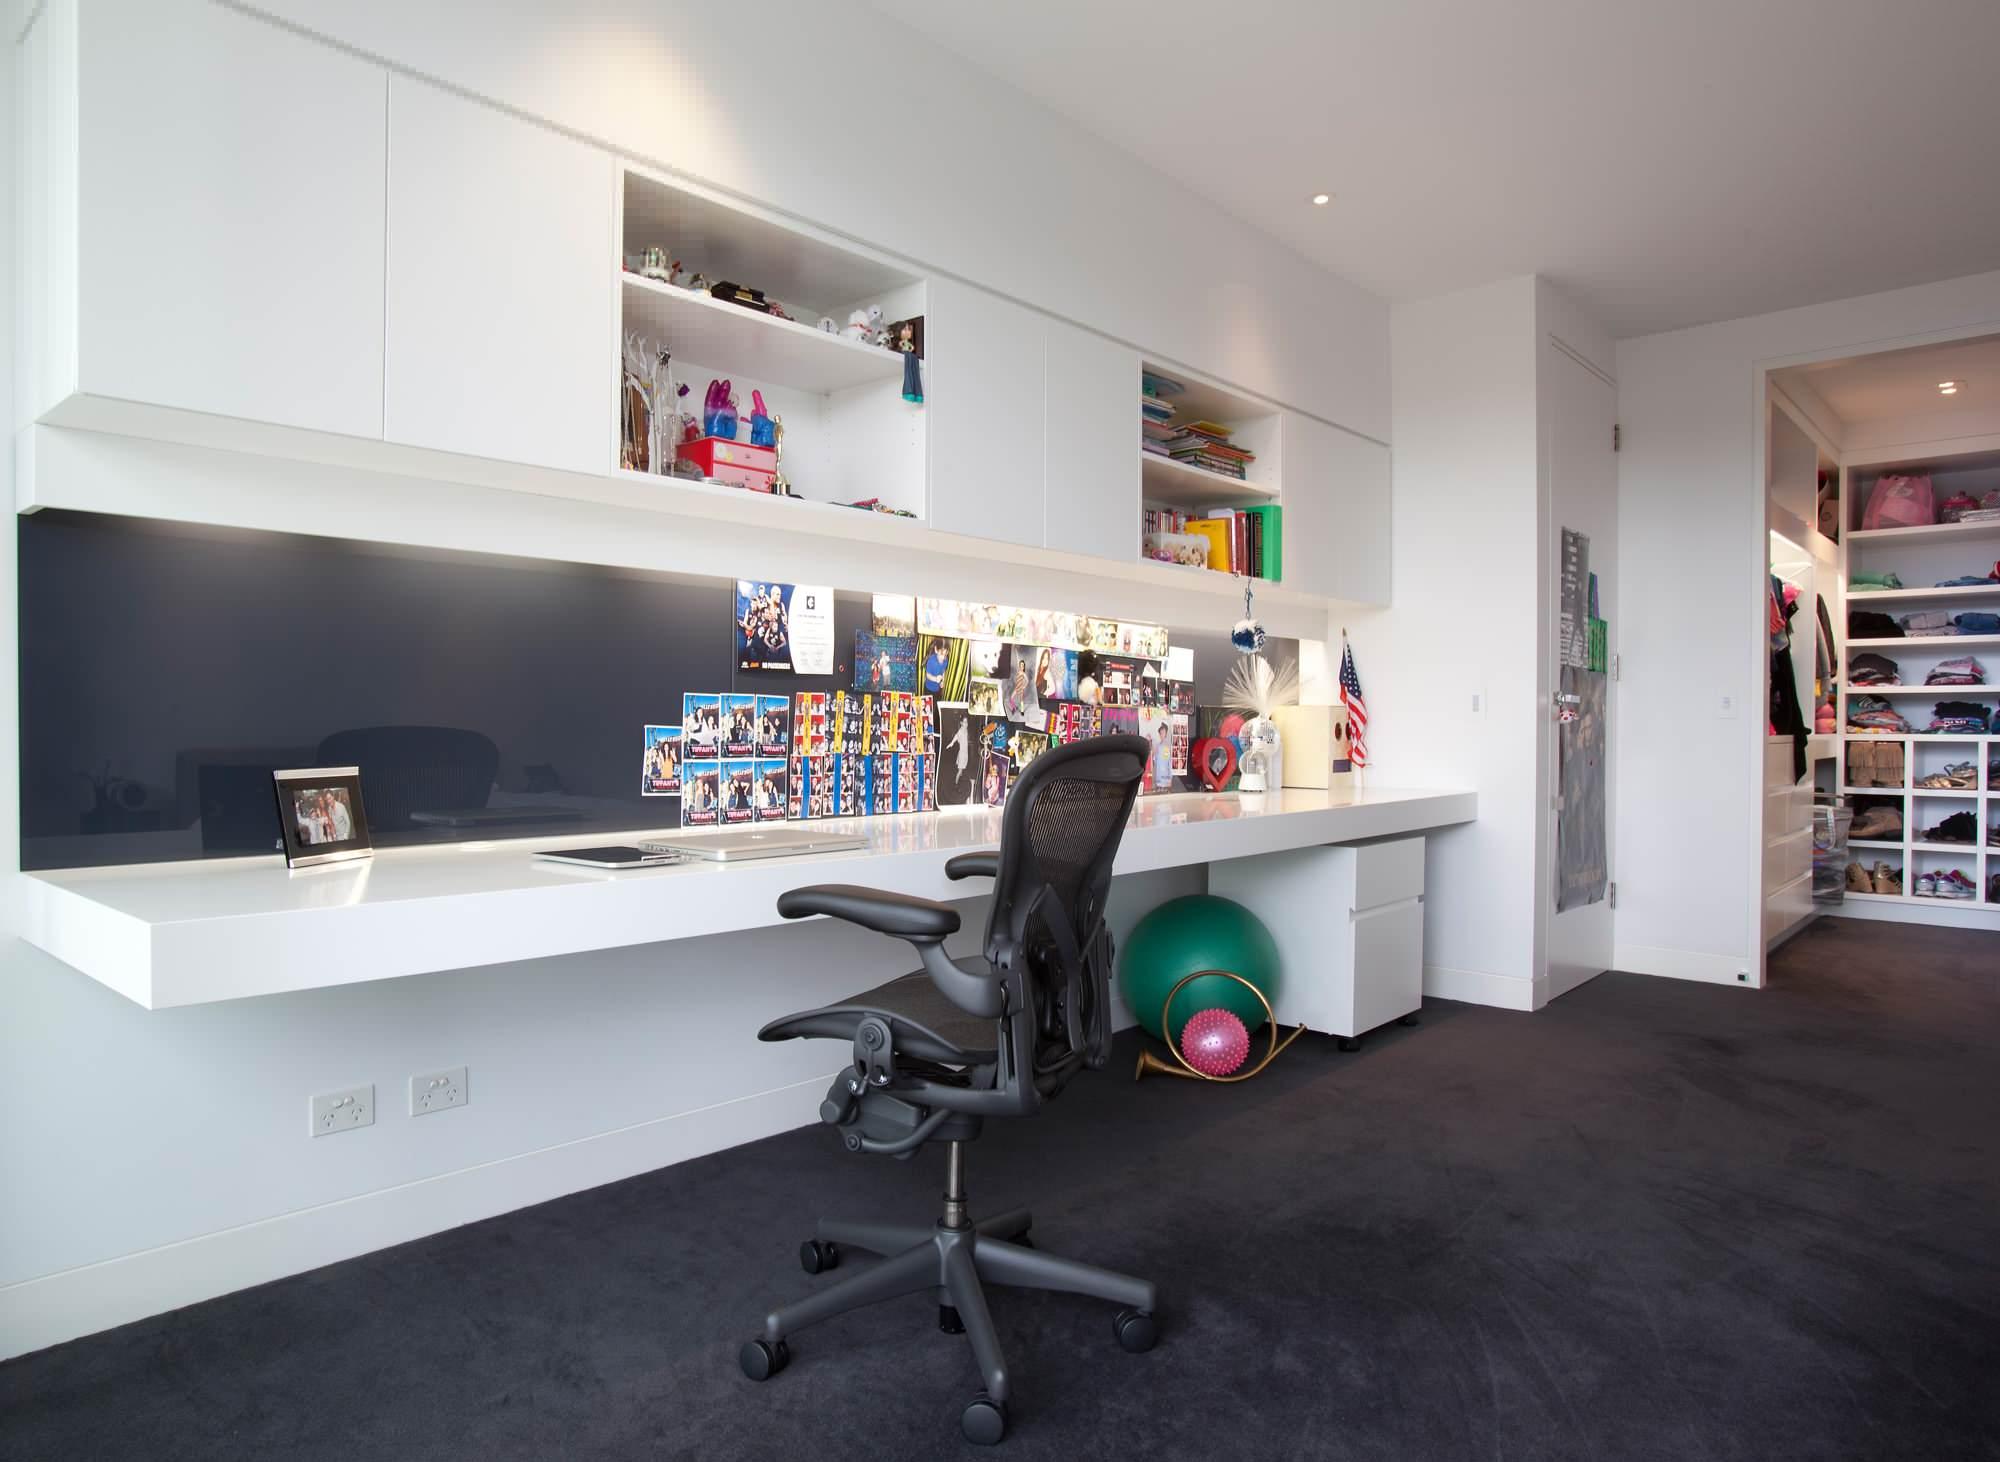 home offices with built in desks phbr0lbl bl l 716